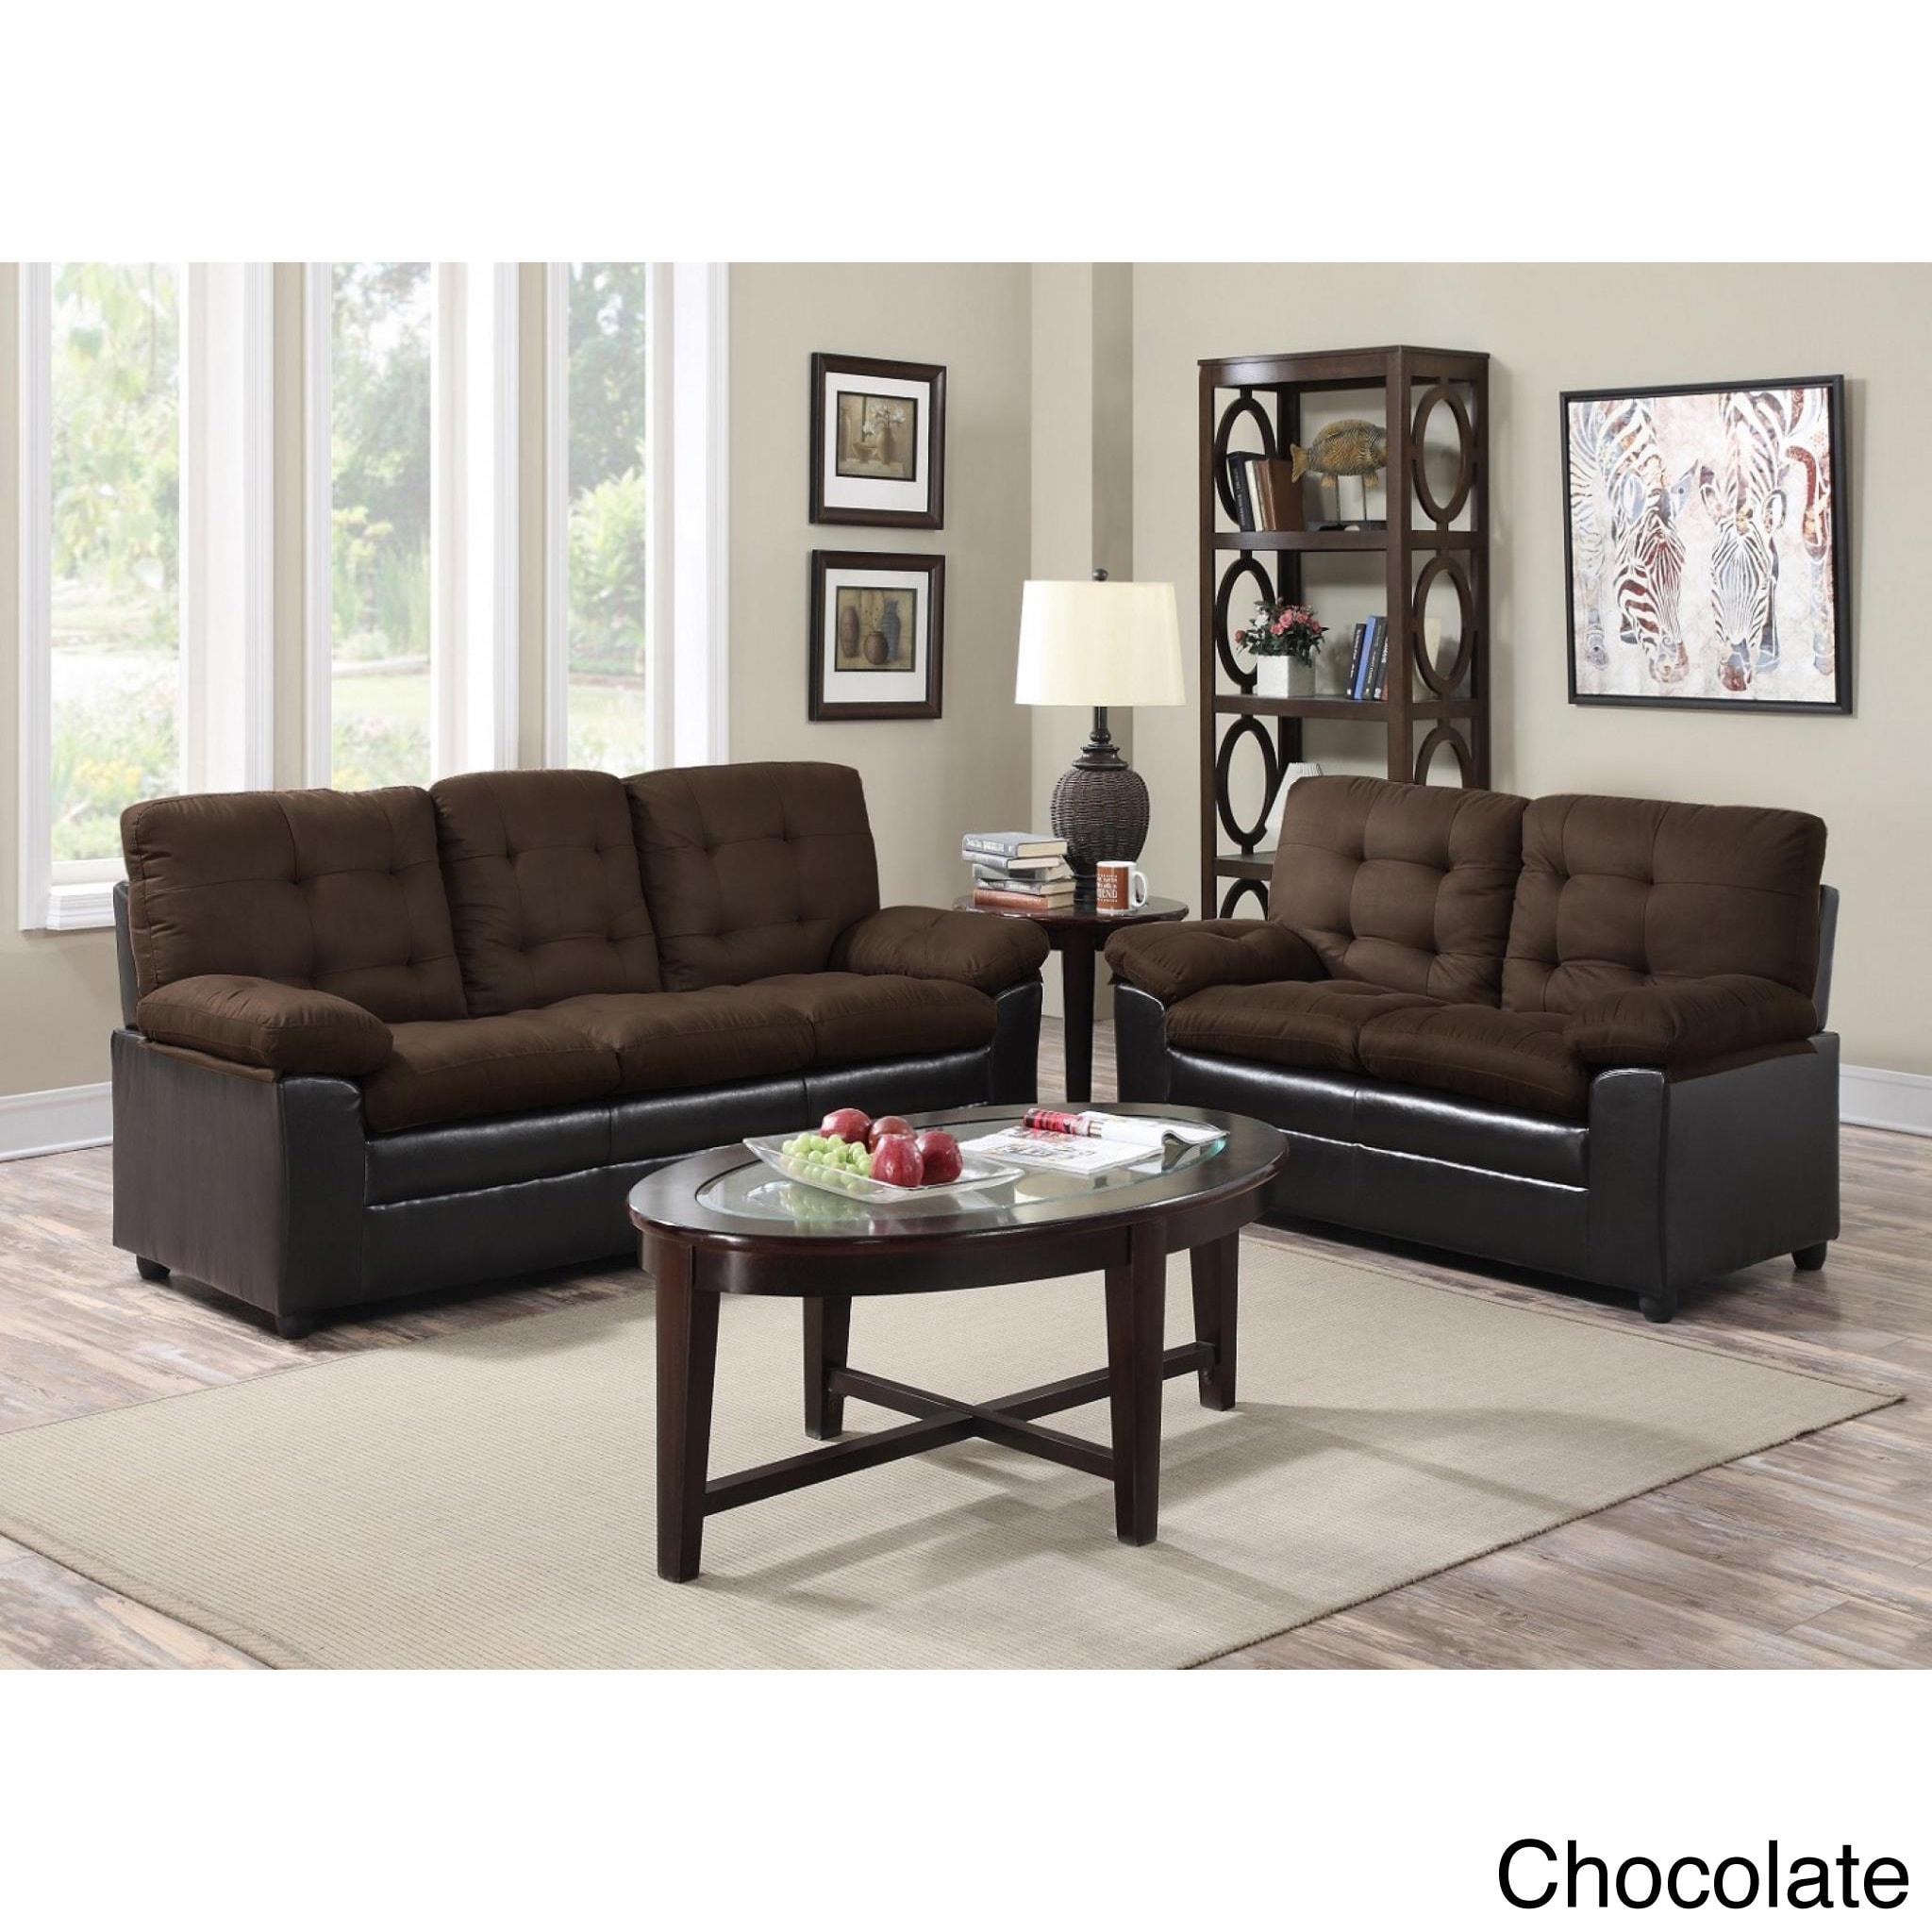 Two-Tone Microfiber Sofa and Loveseat Set (Chocolate), Br...